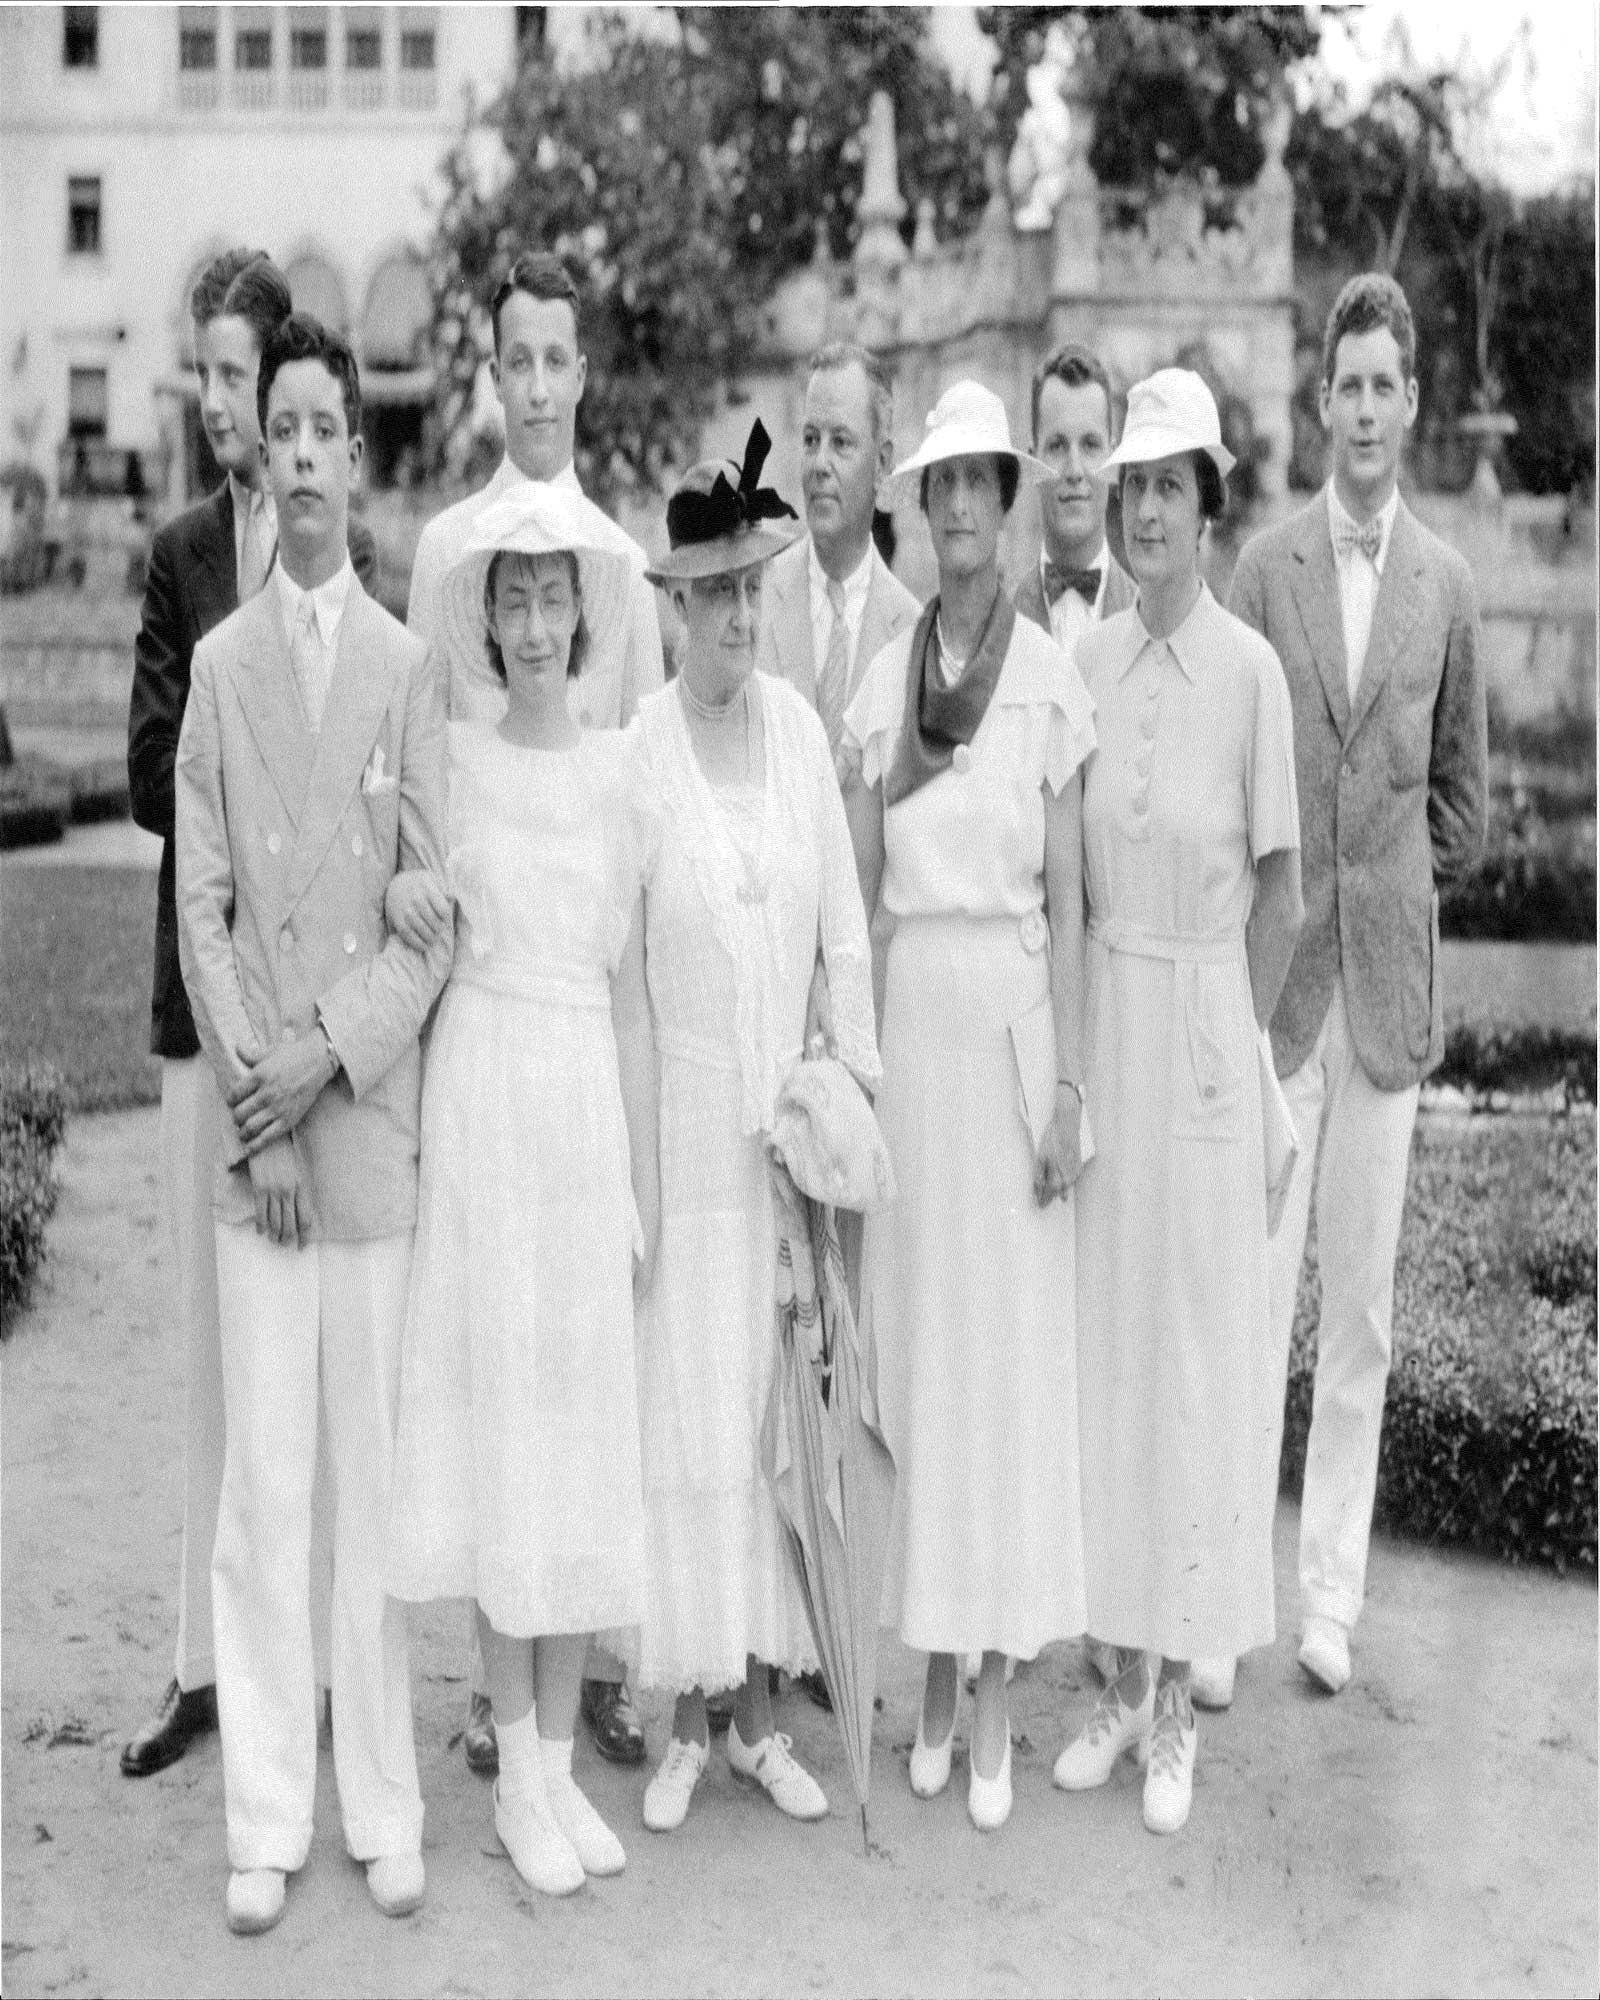 Deering family members at Villa Vizcaya, winter home of James Deering (Charles' younger half-brother) ca. 1930s